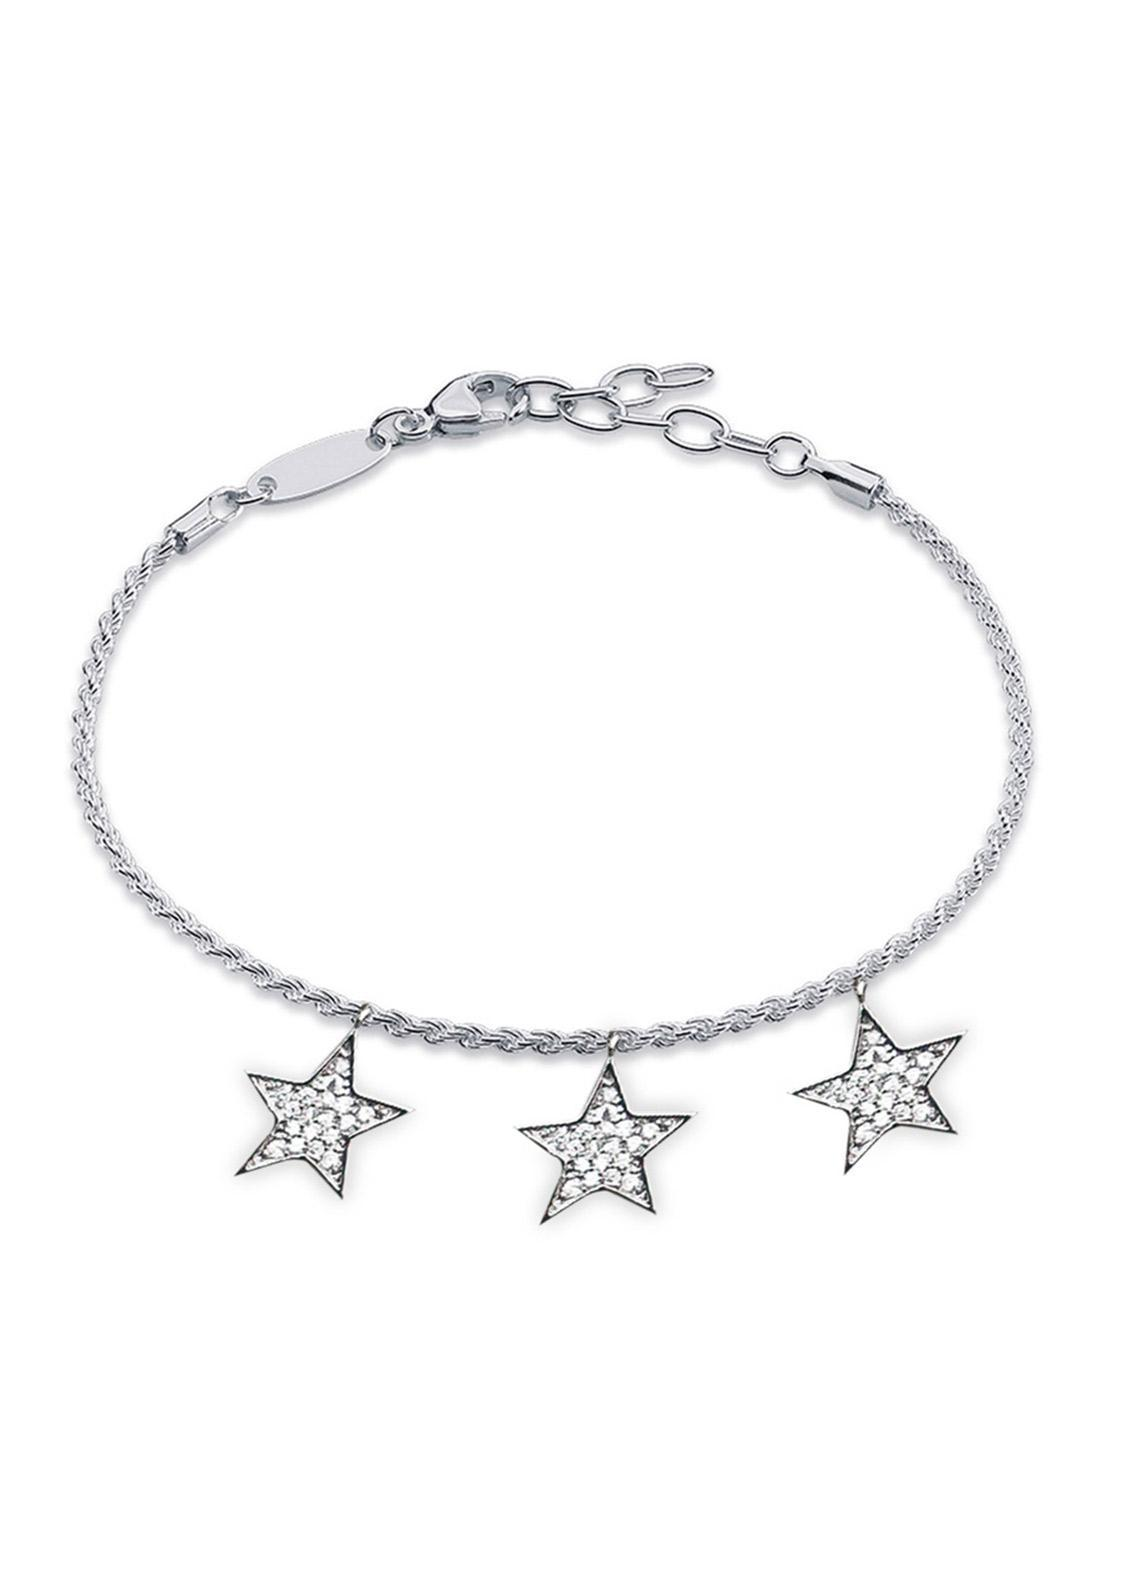 Anna Grace London Silver Crystal Stars Bracelet AGB0067 - Ladies Jewellery